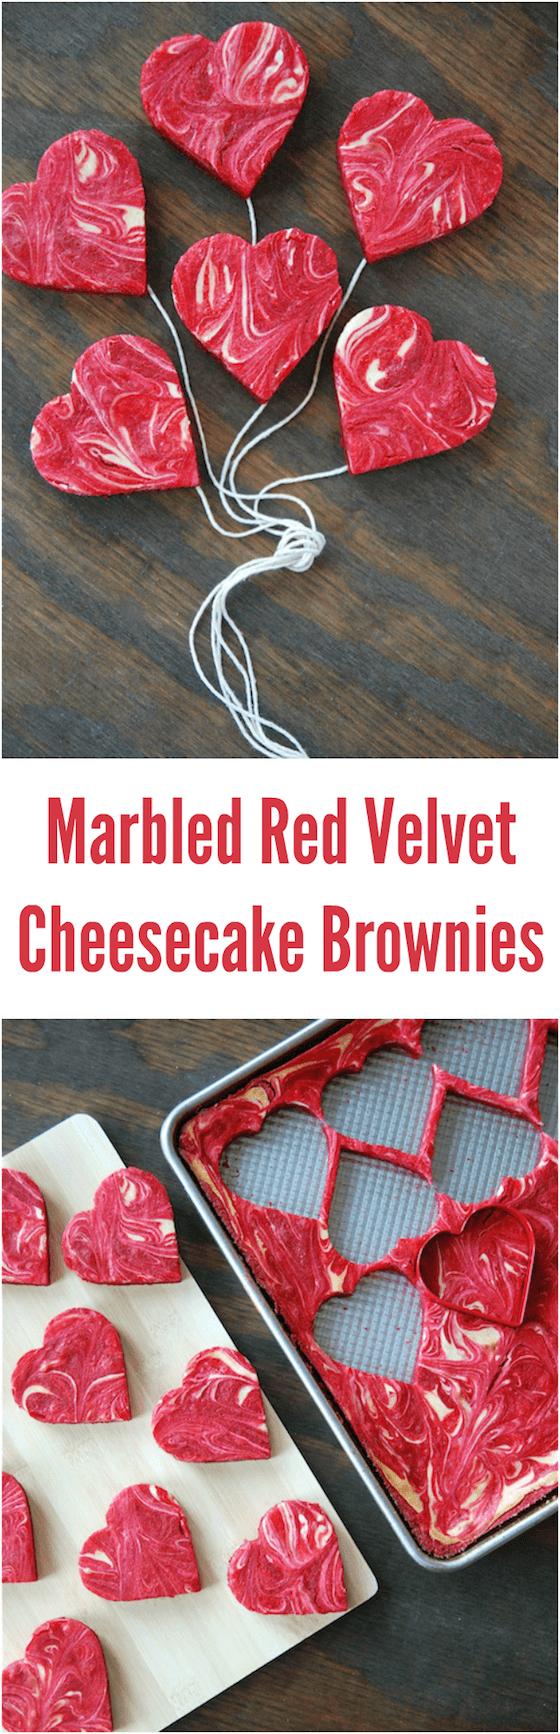 Easy Red Velvet Cheesecake Brownie Recipe